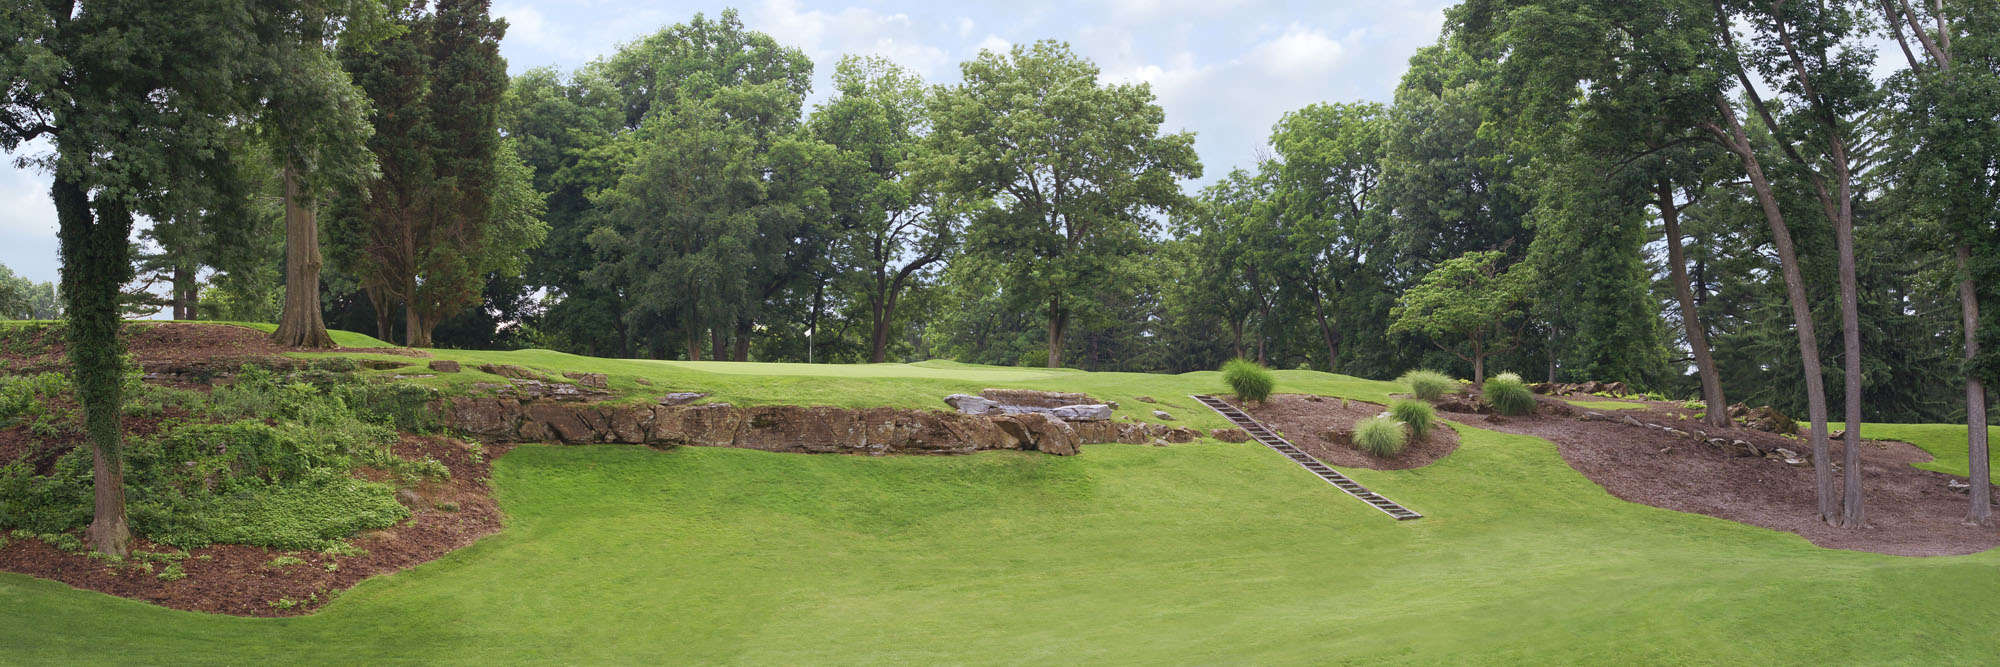 Golf Course Image - Berkshire No. 6